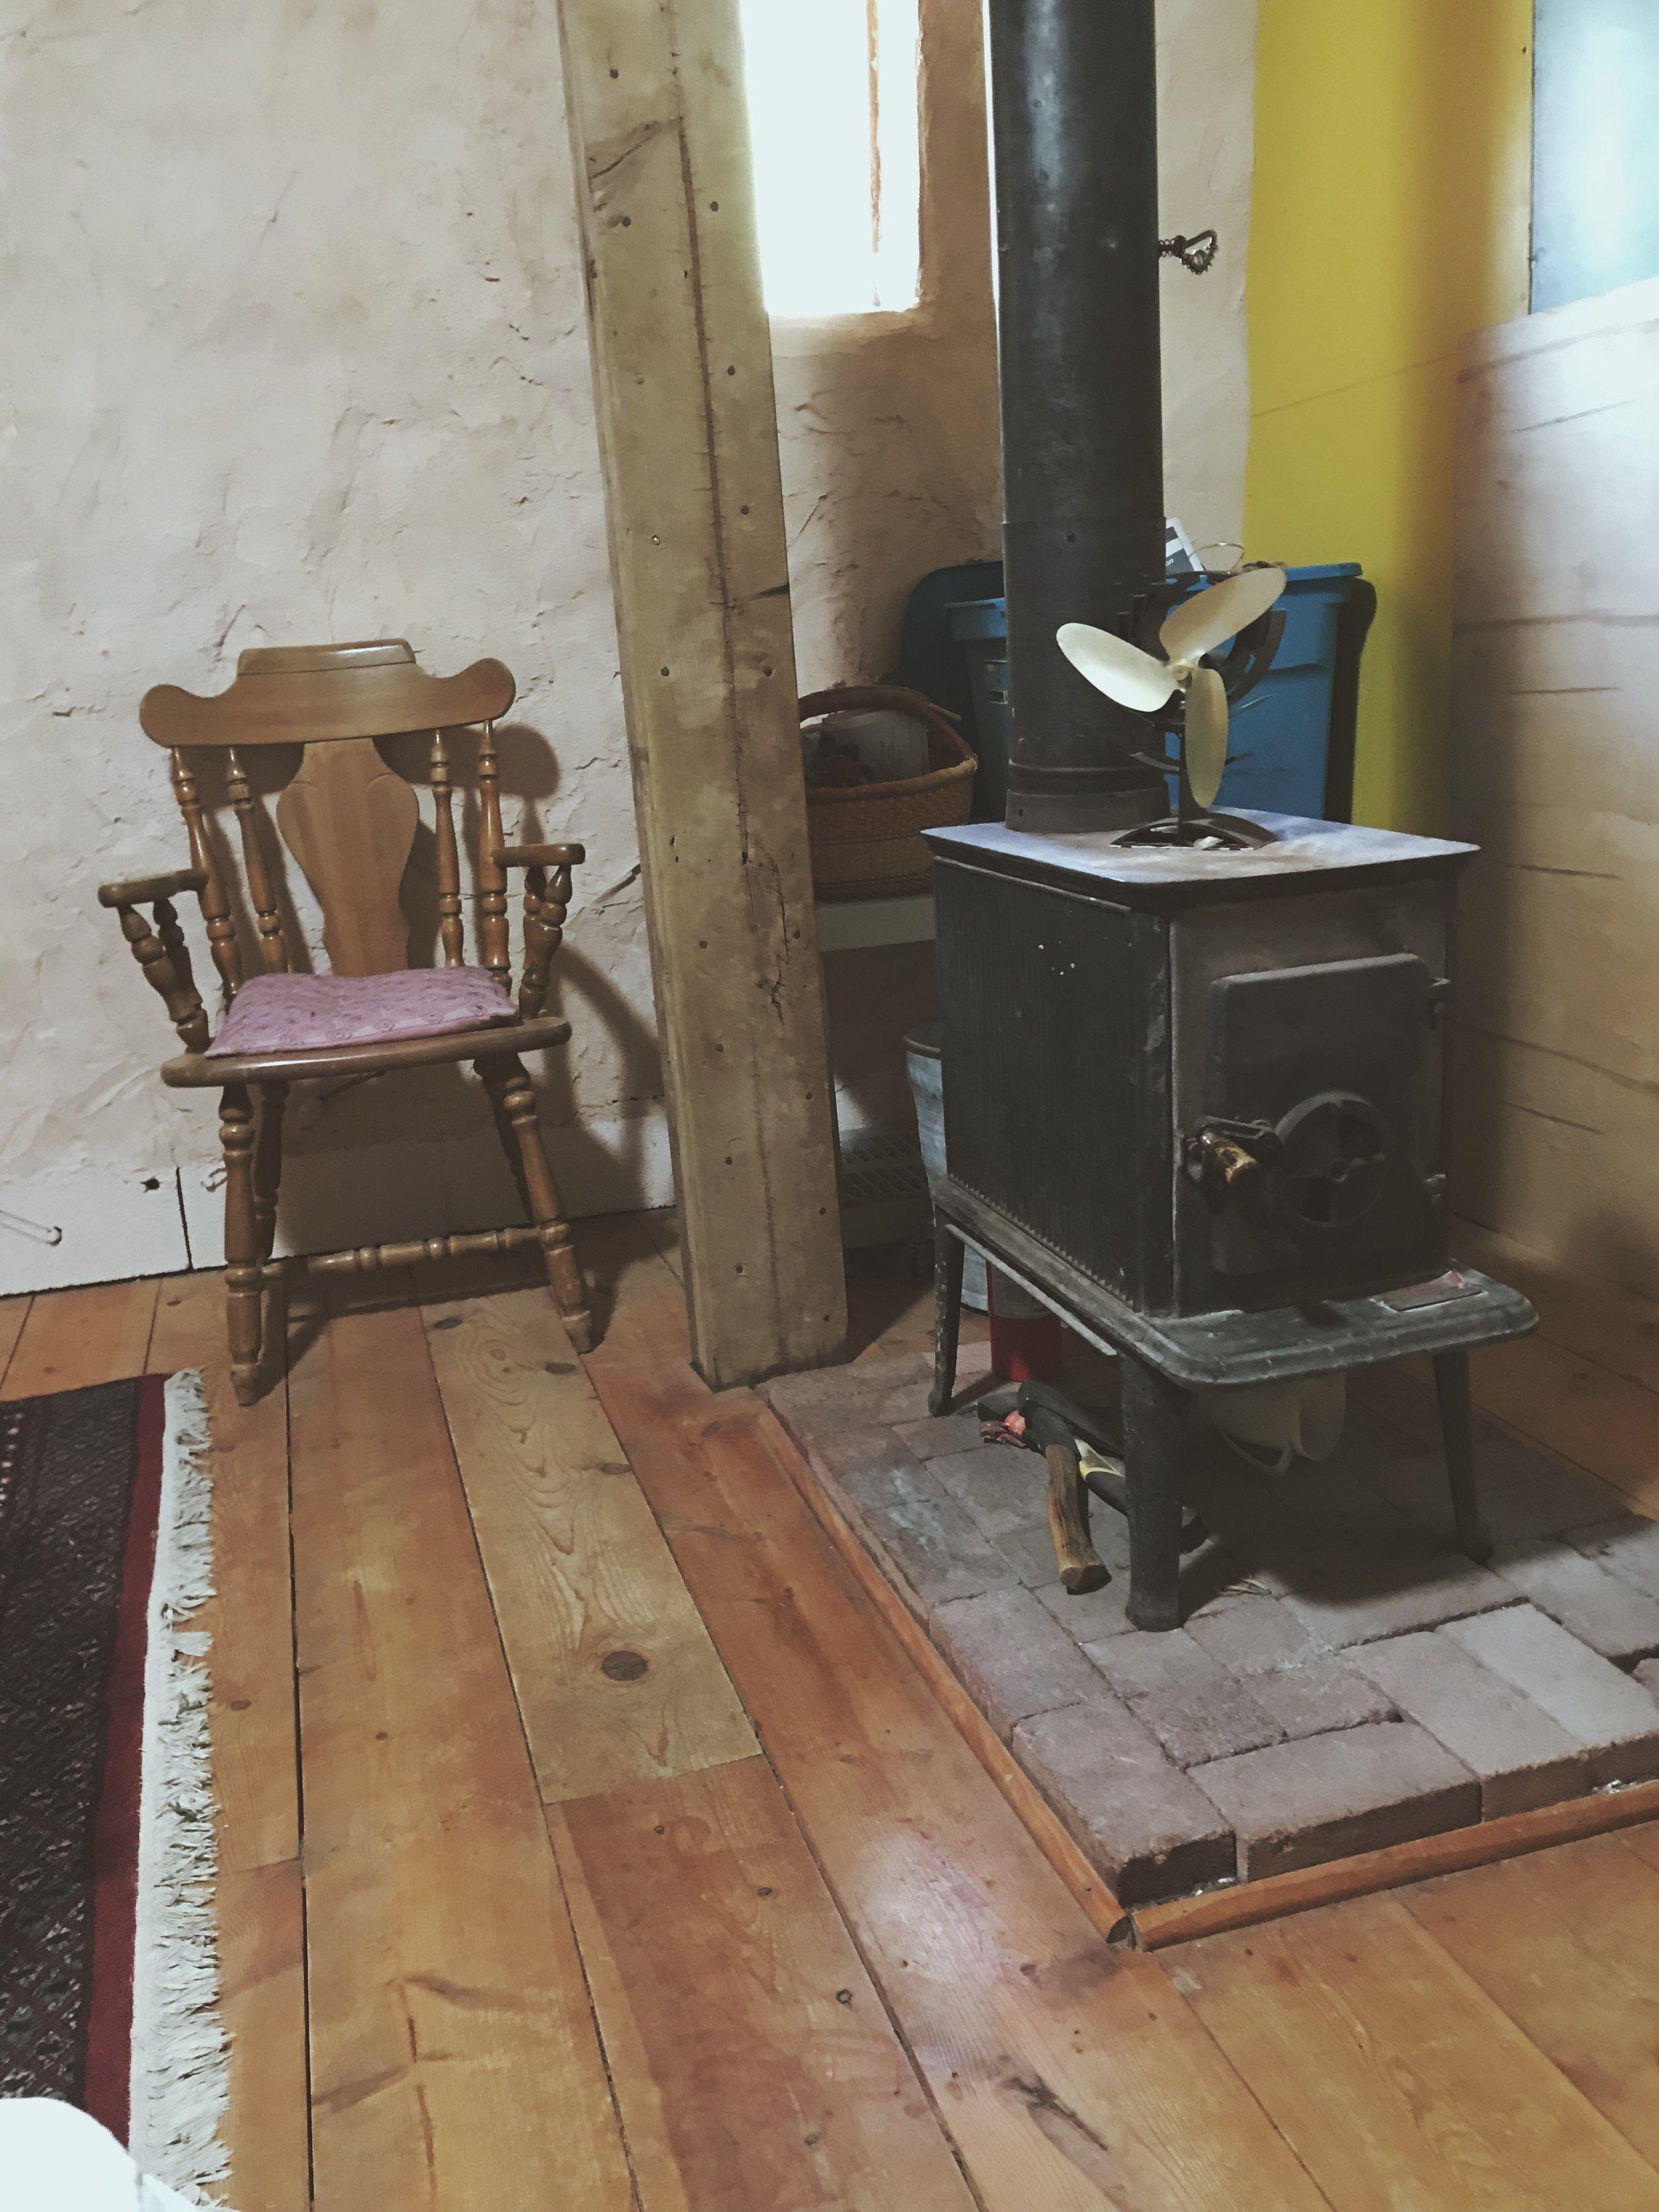 Cob House Interior Wood Stove | Tree Talker Art